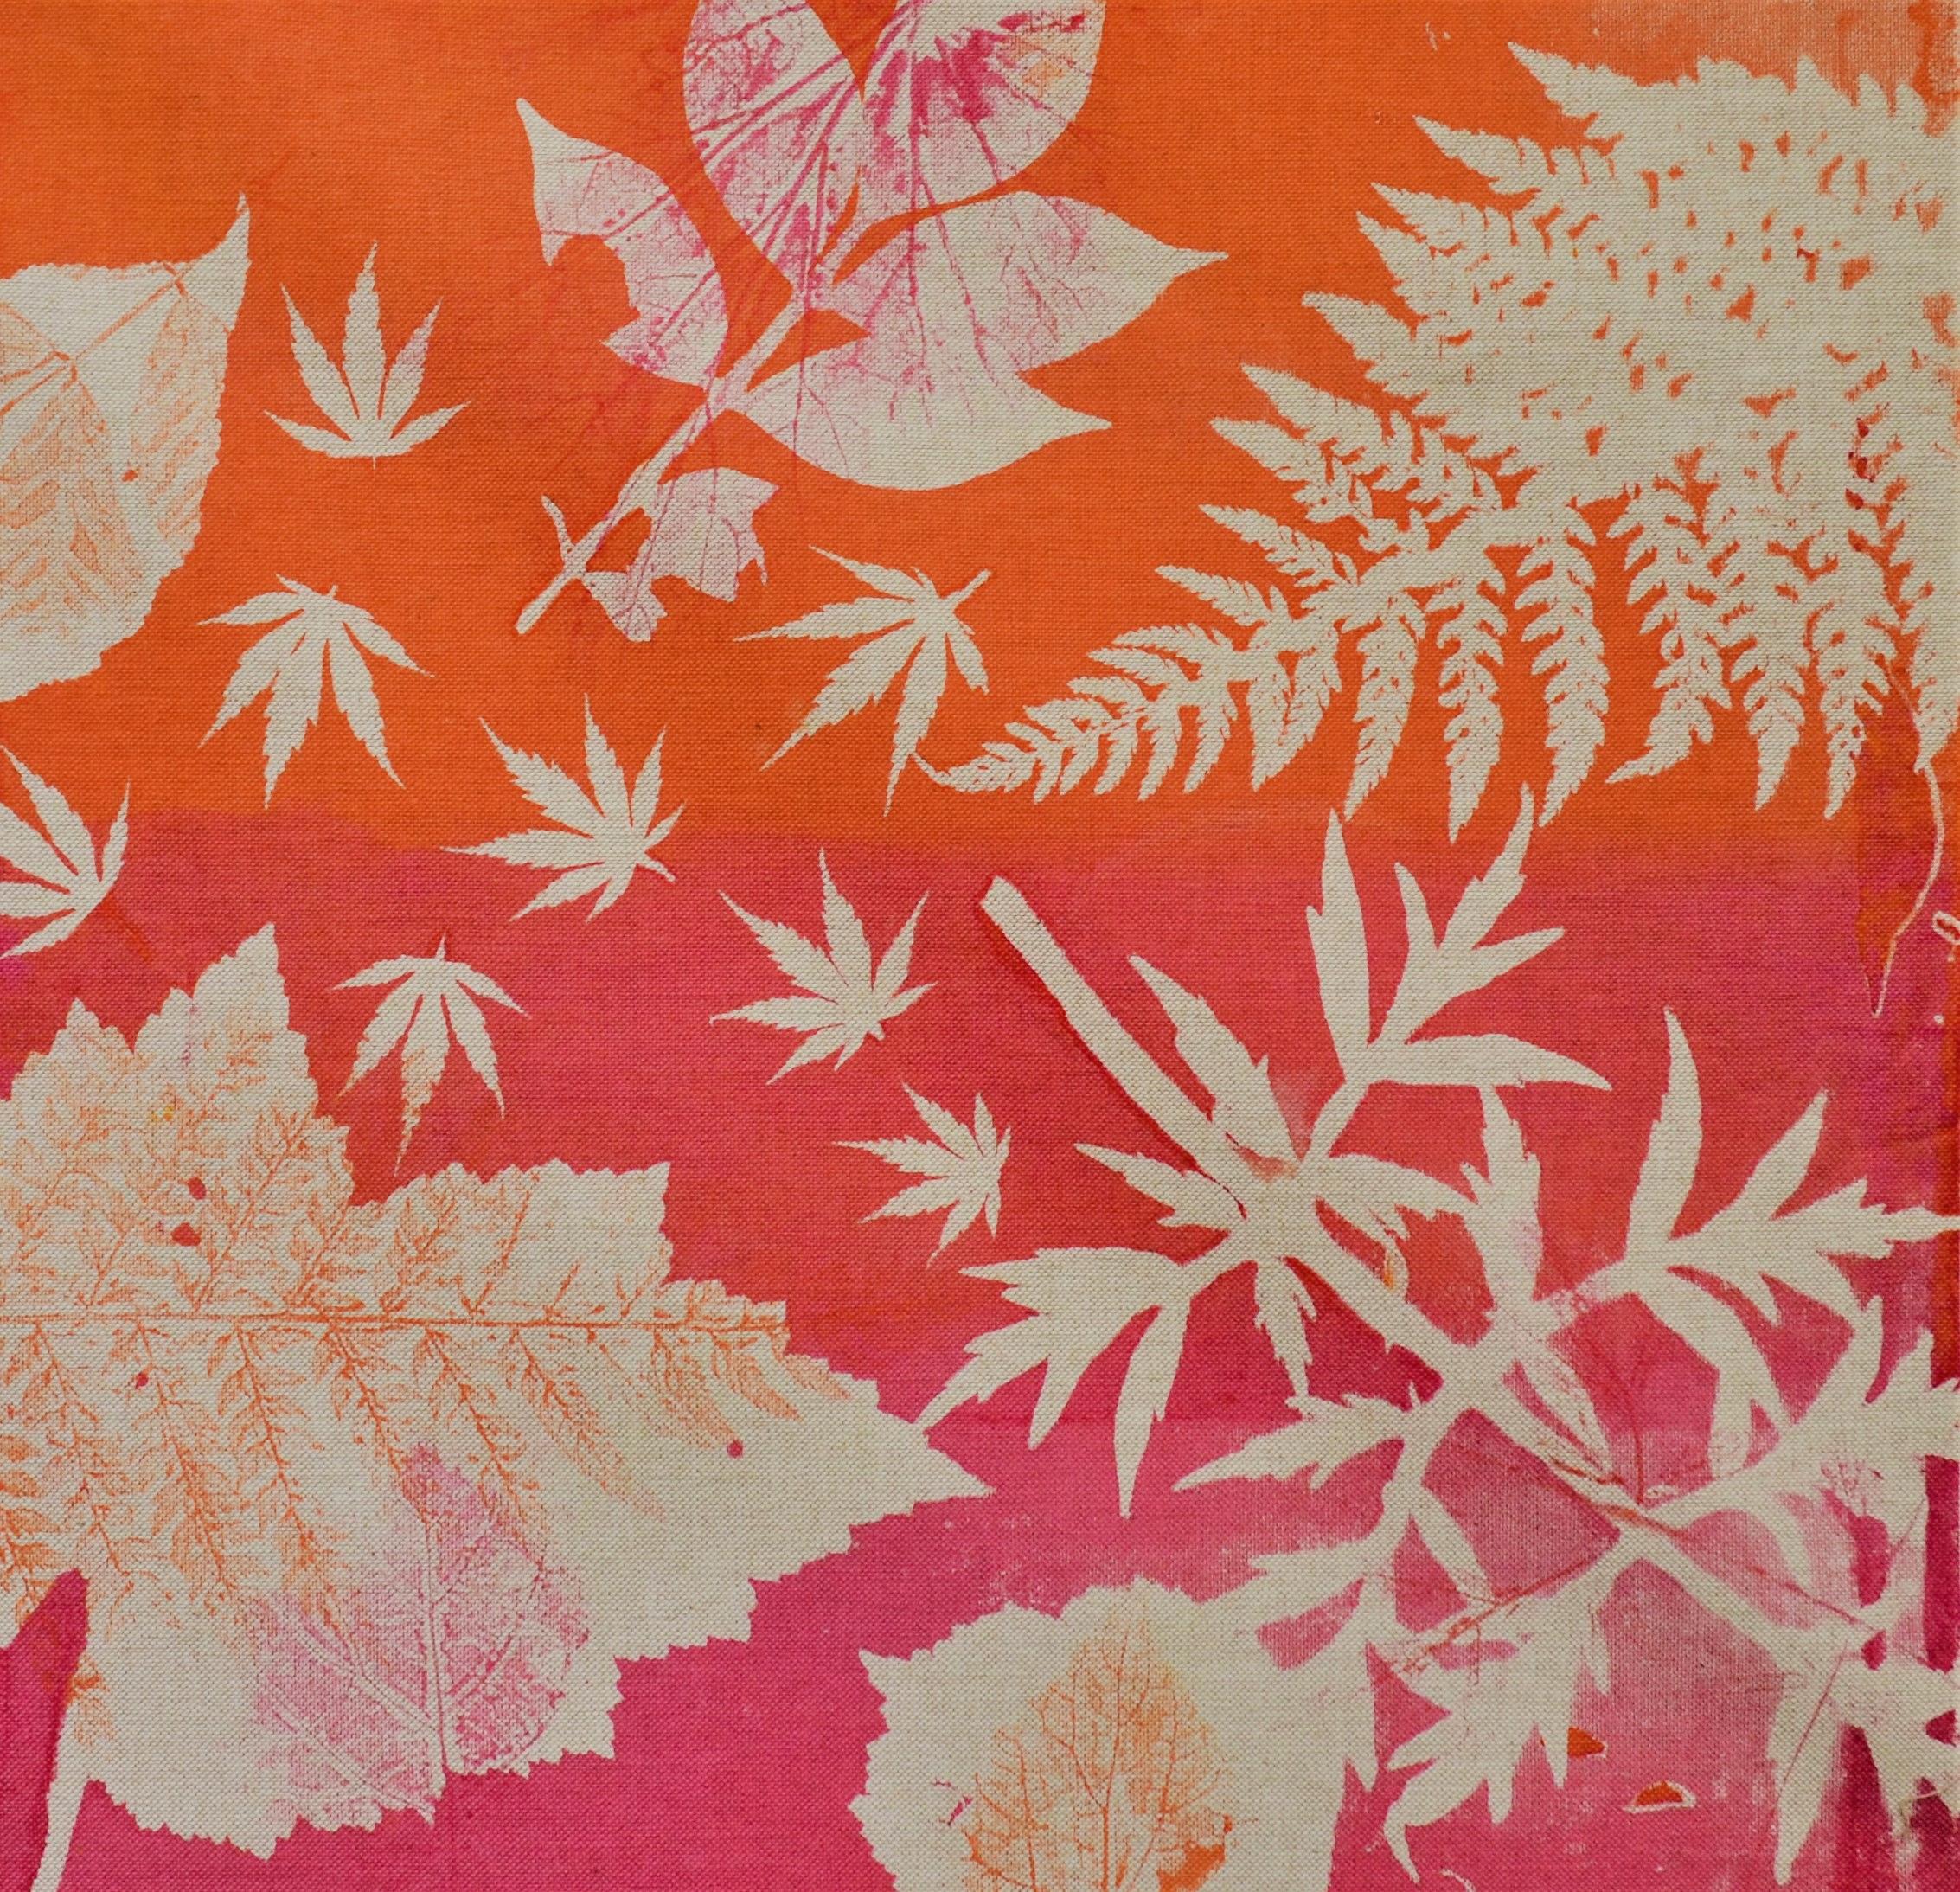 Mono-printed screen print with seasonal leaves